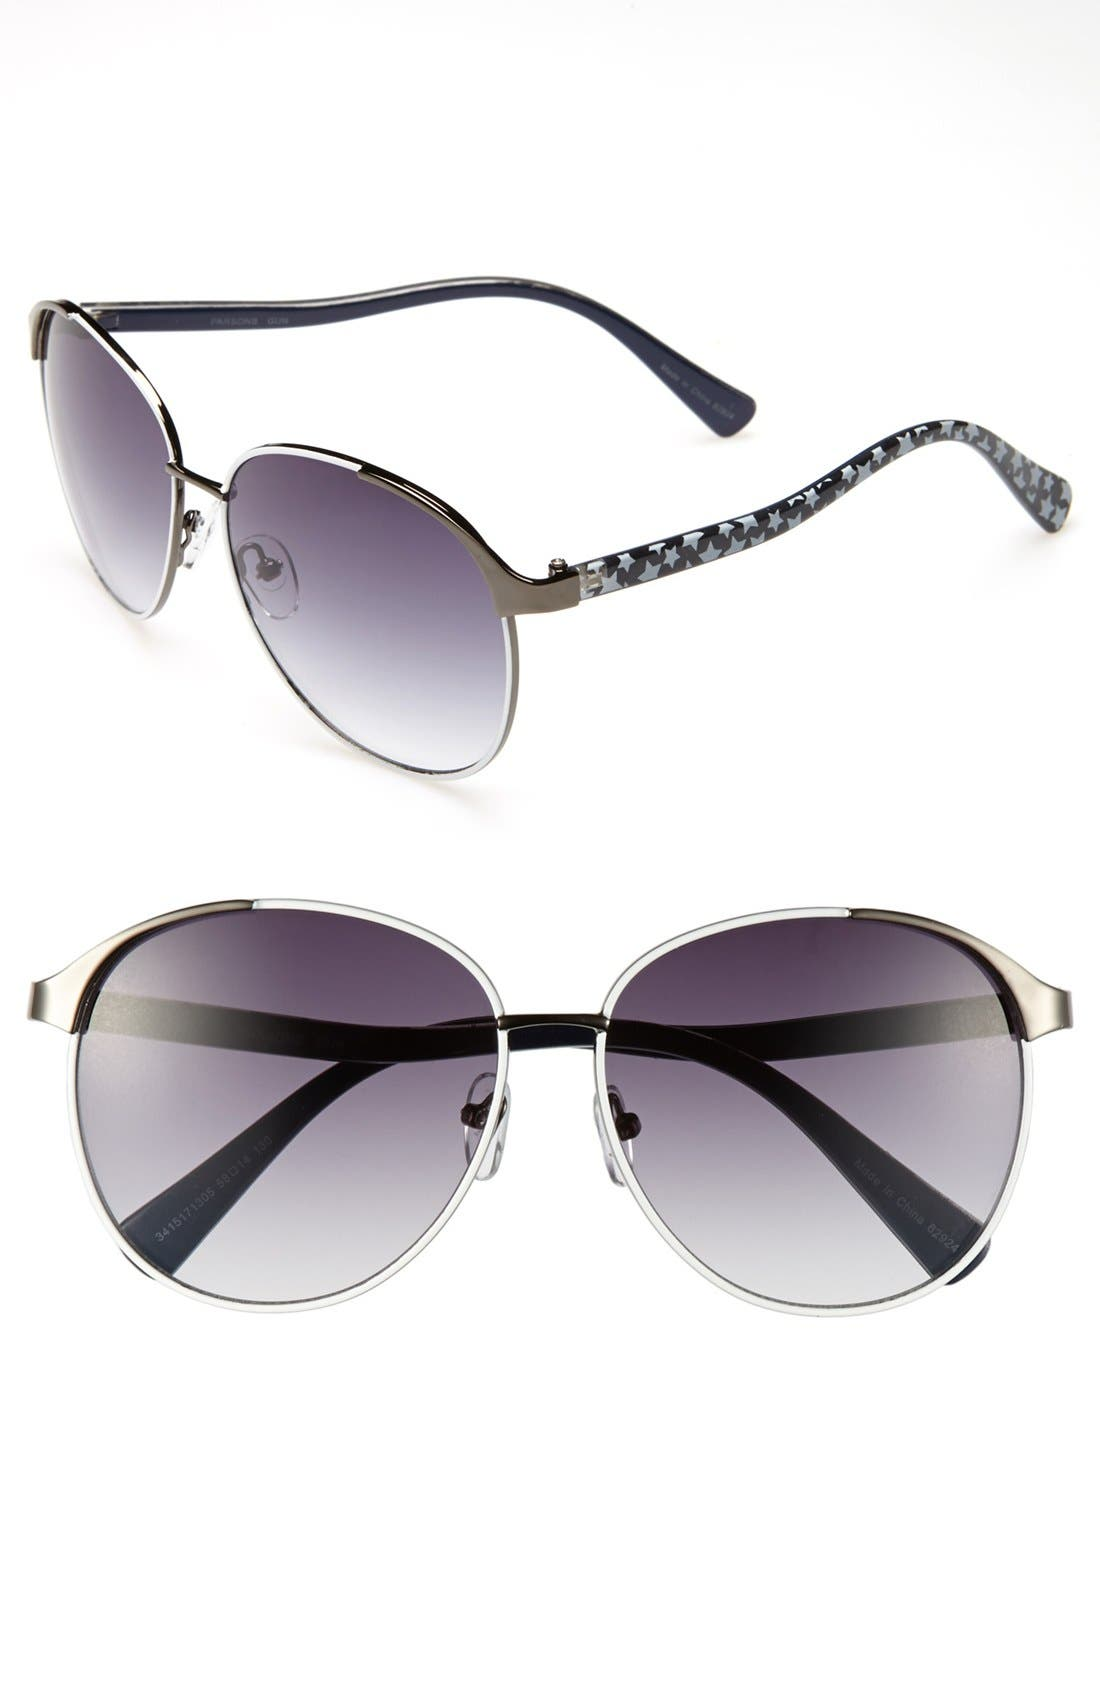 Main Image - Outlook Eyewear 'Parsons' 58mm Sunglasses